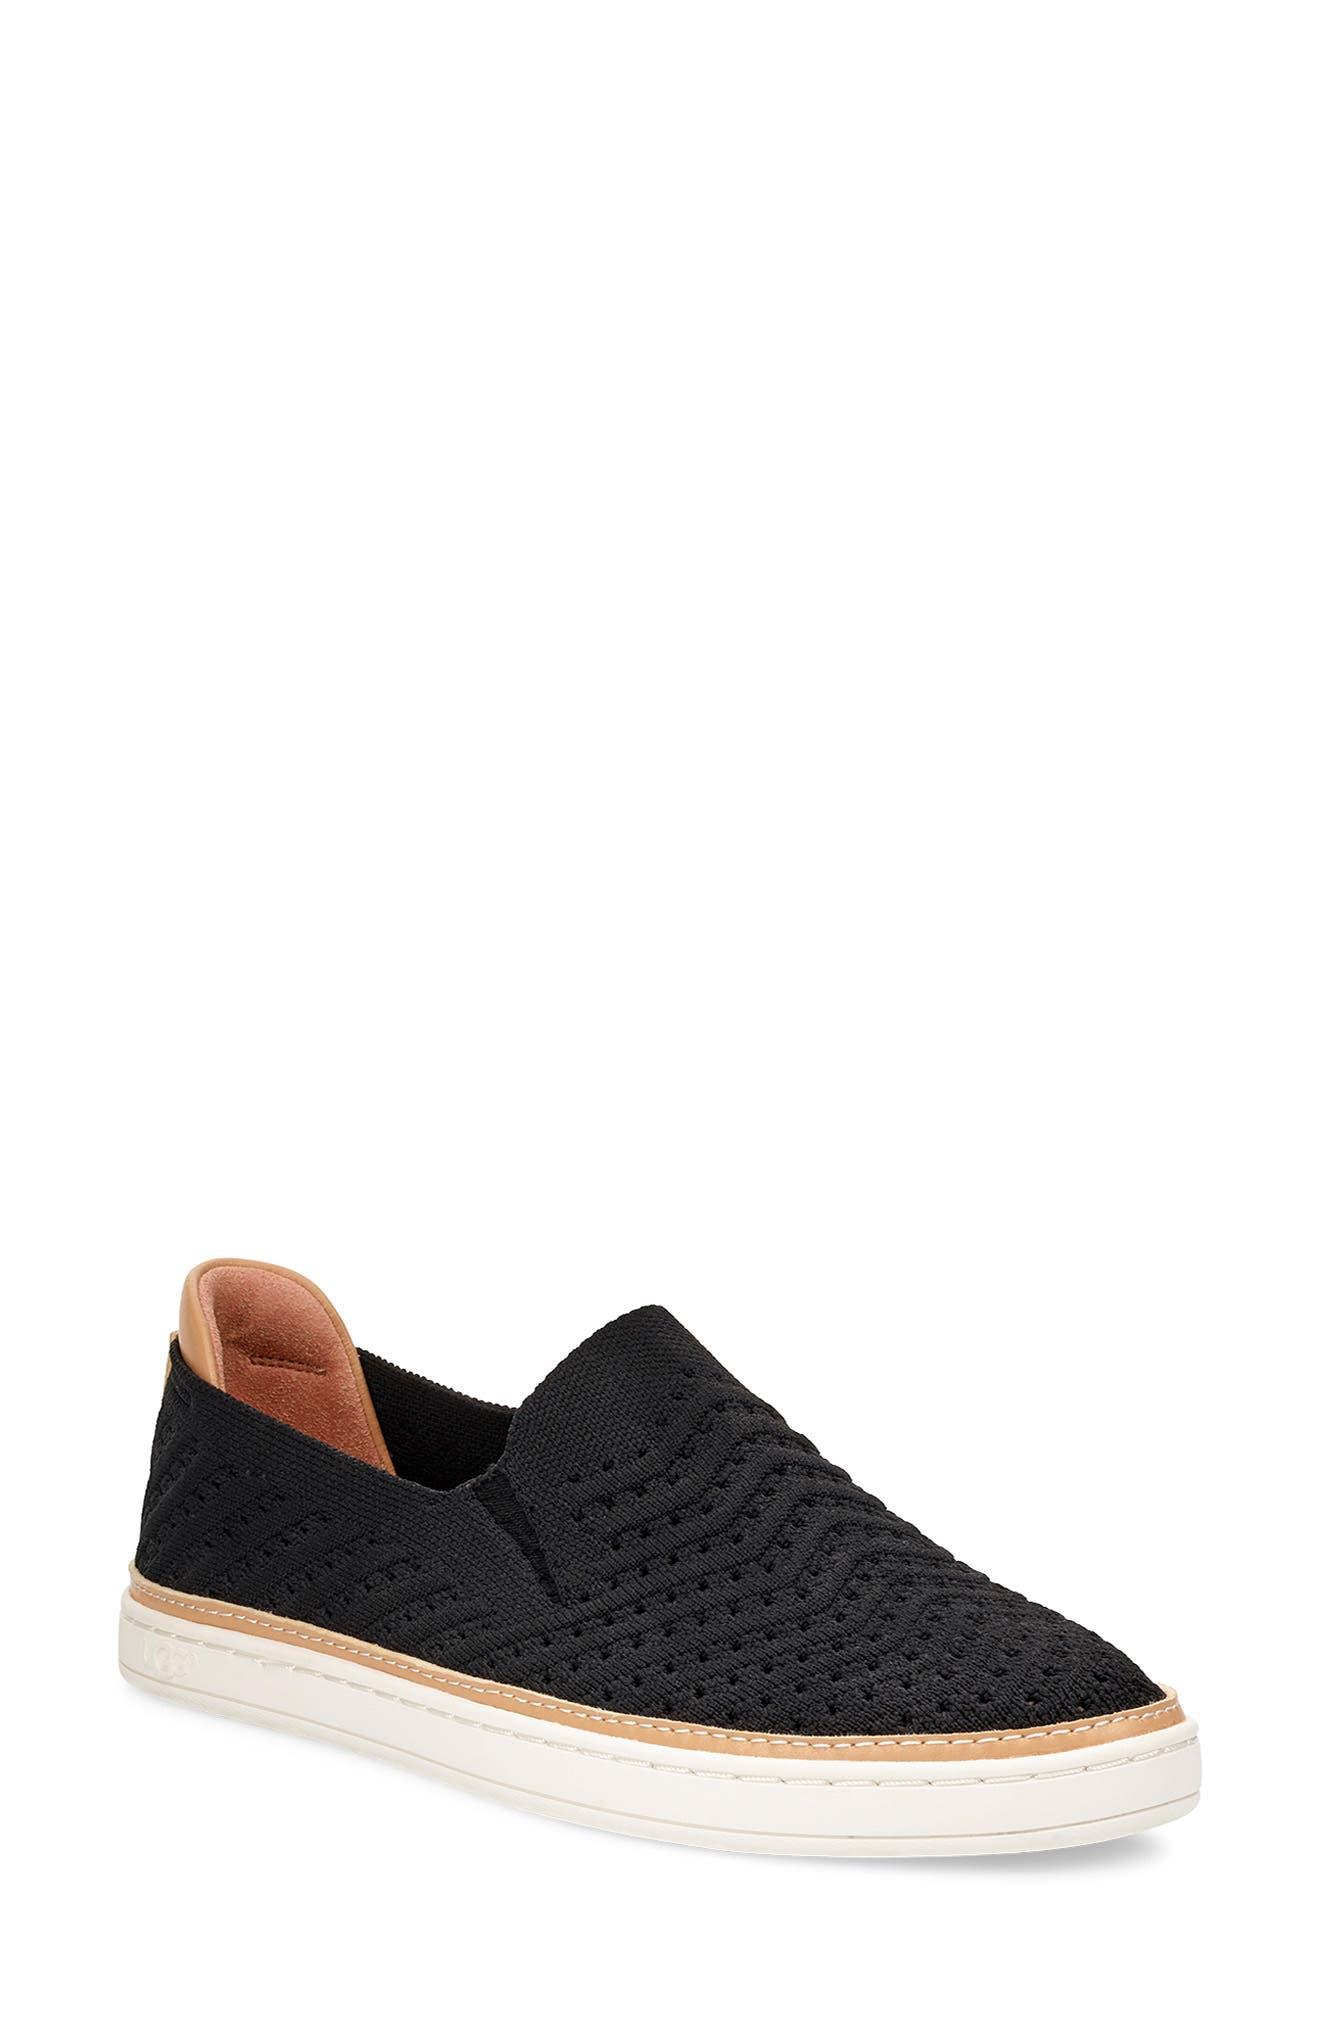 UGG<SUP>®</SUP> Sammy Slip-On Sneaker, Main, color, BLACK FABRIC